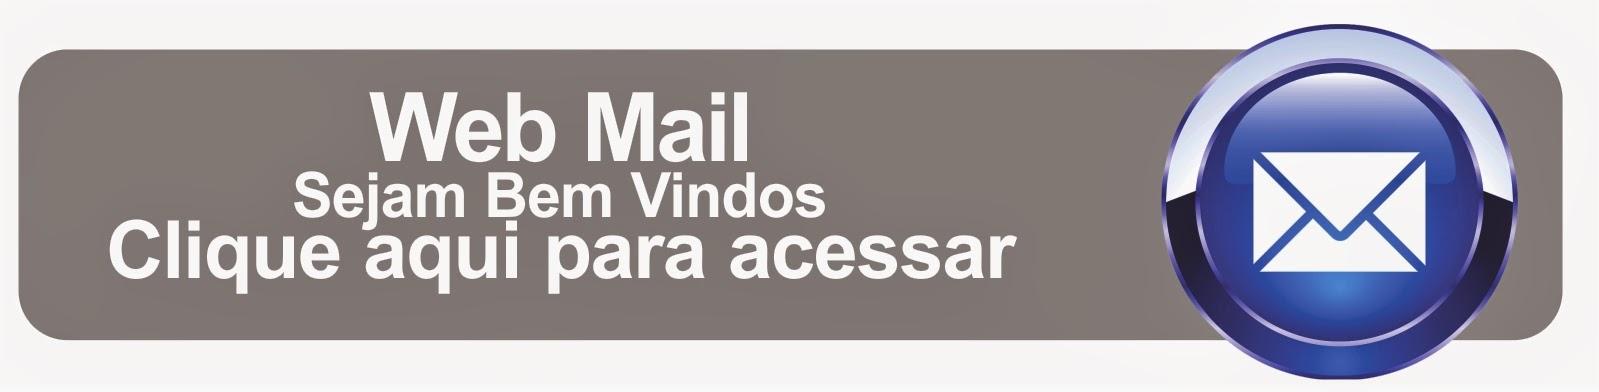 WEB - MAIL